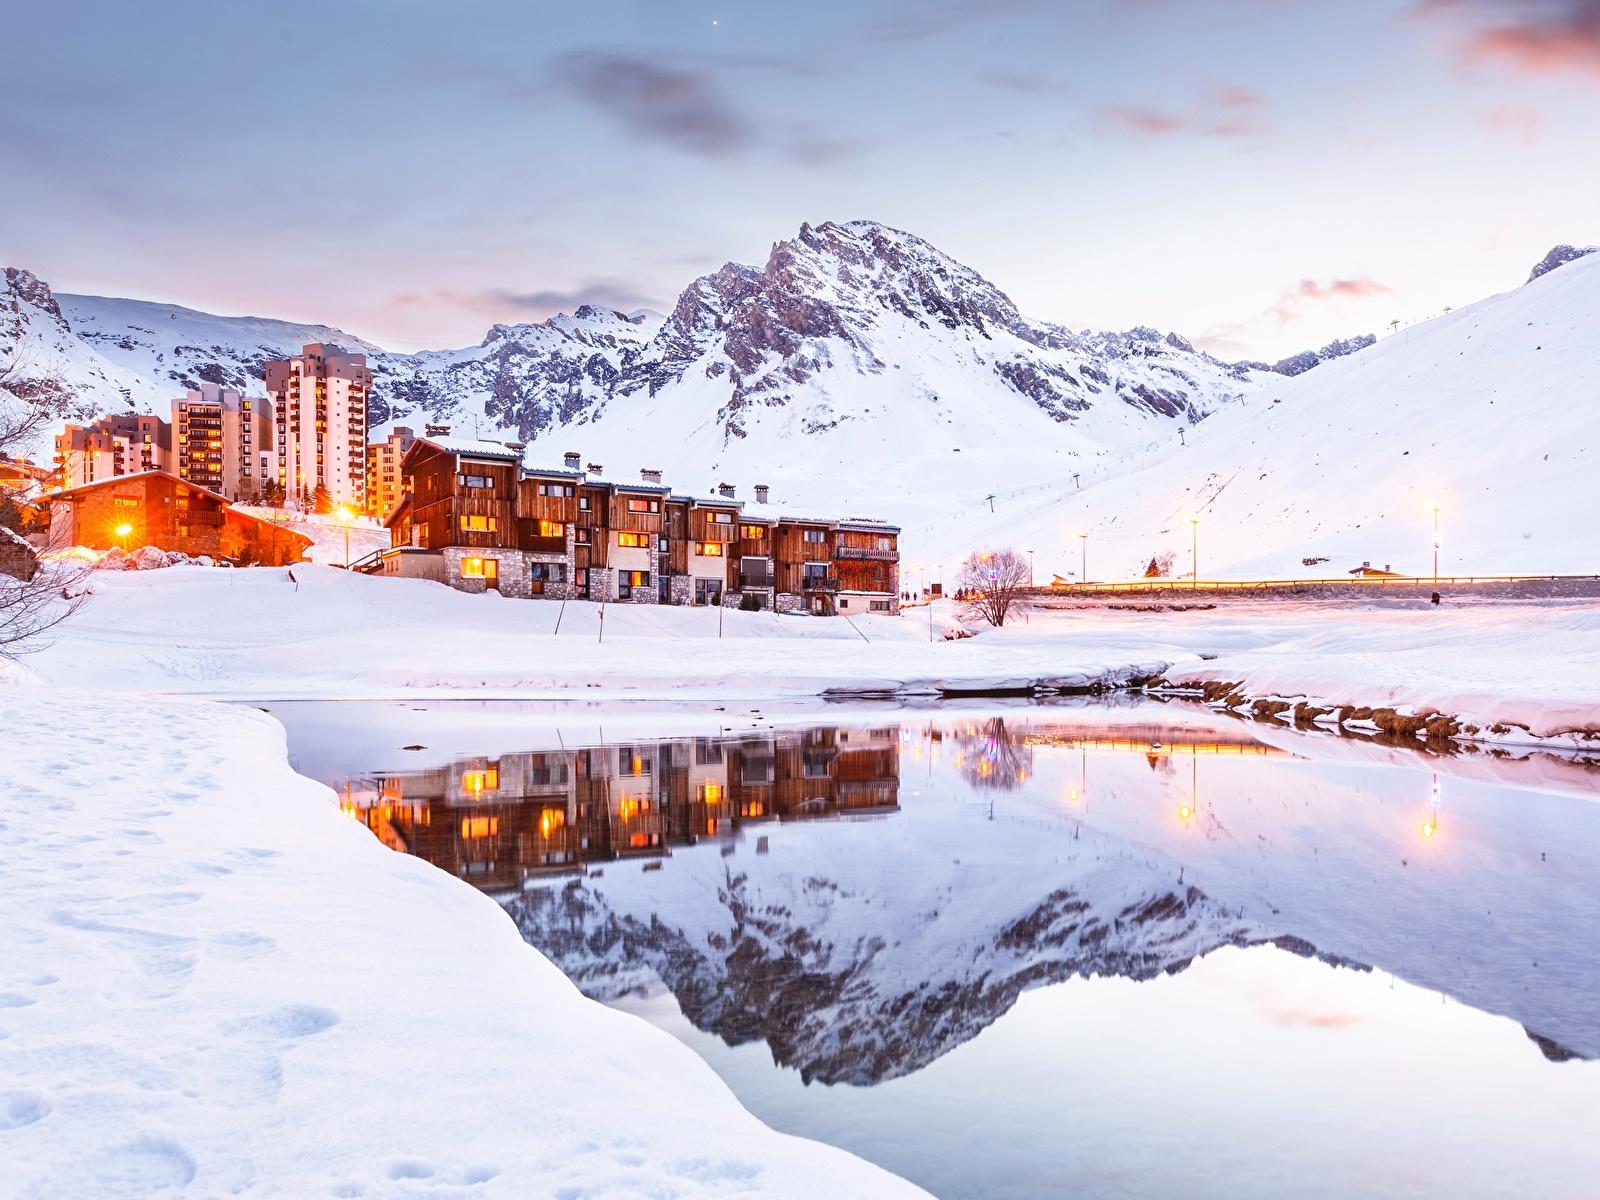 Photos Alps France Tignes Nature Winter Mountains Snow 1600x1200 1600x1200